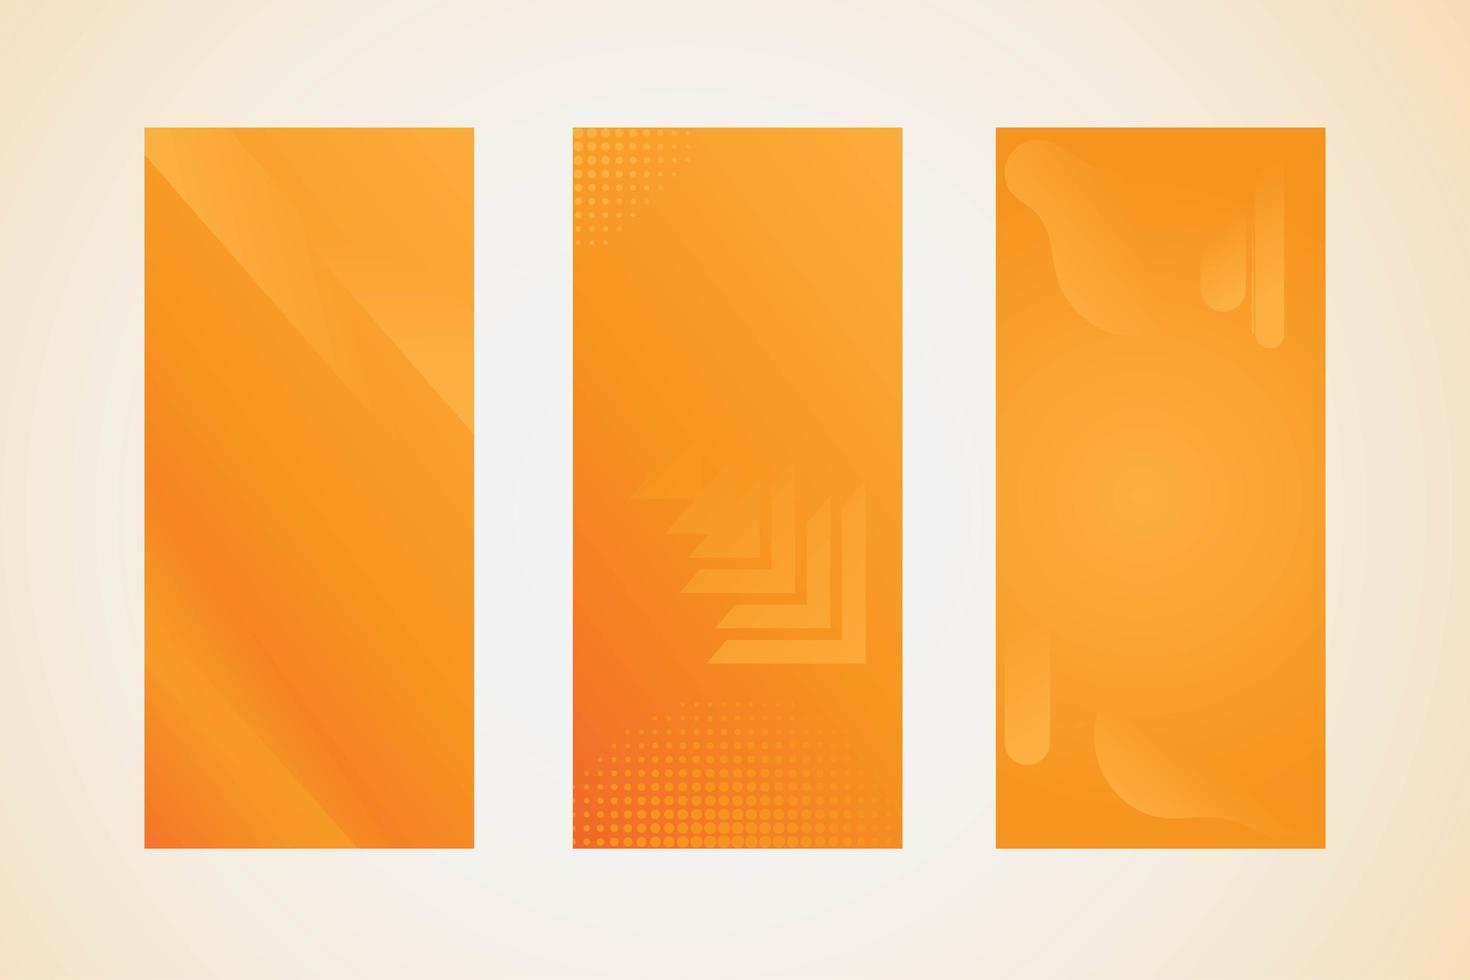 banner geometrici social media arancione vettore